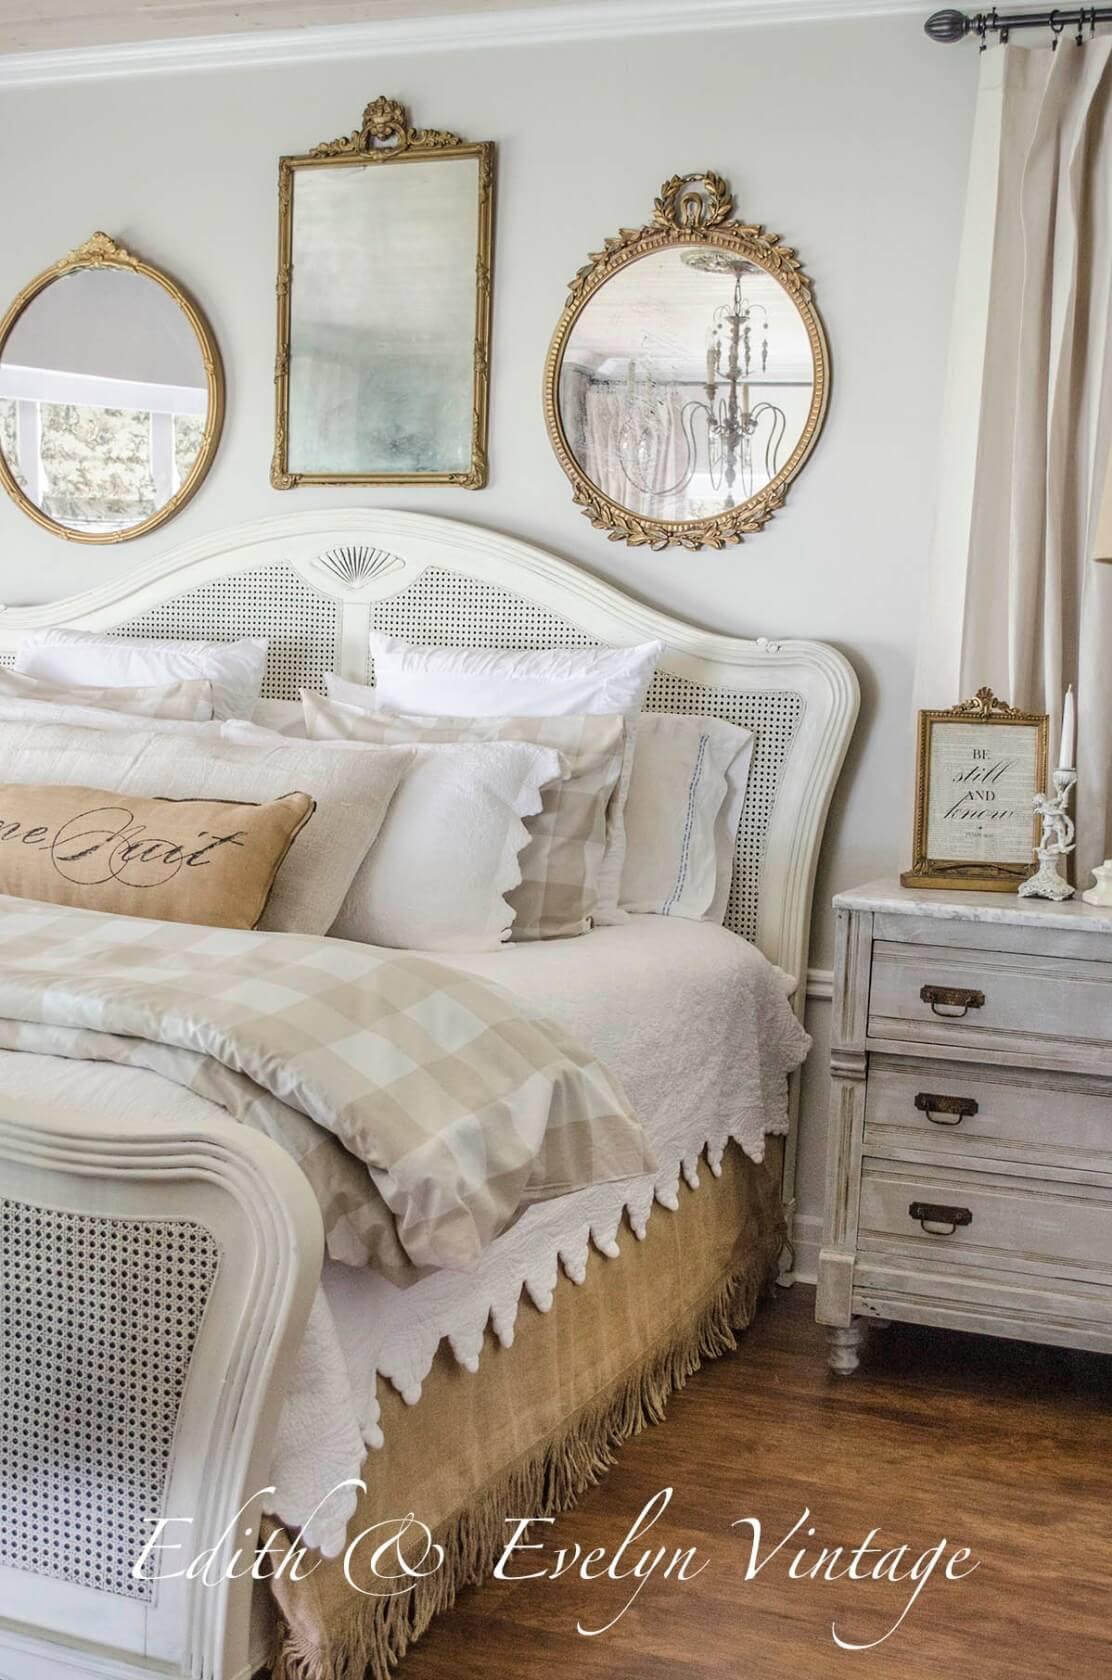 Vintage Parlor Multi-Mirrored Bed Trio